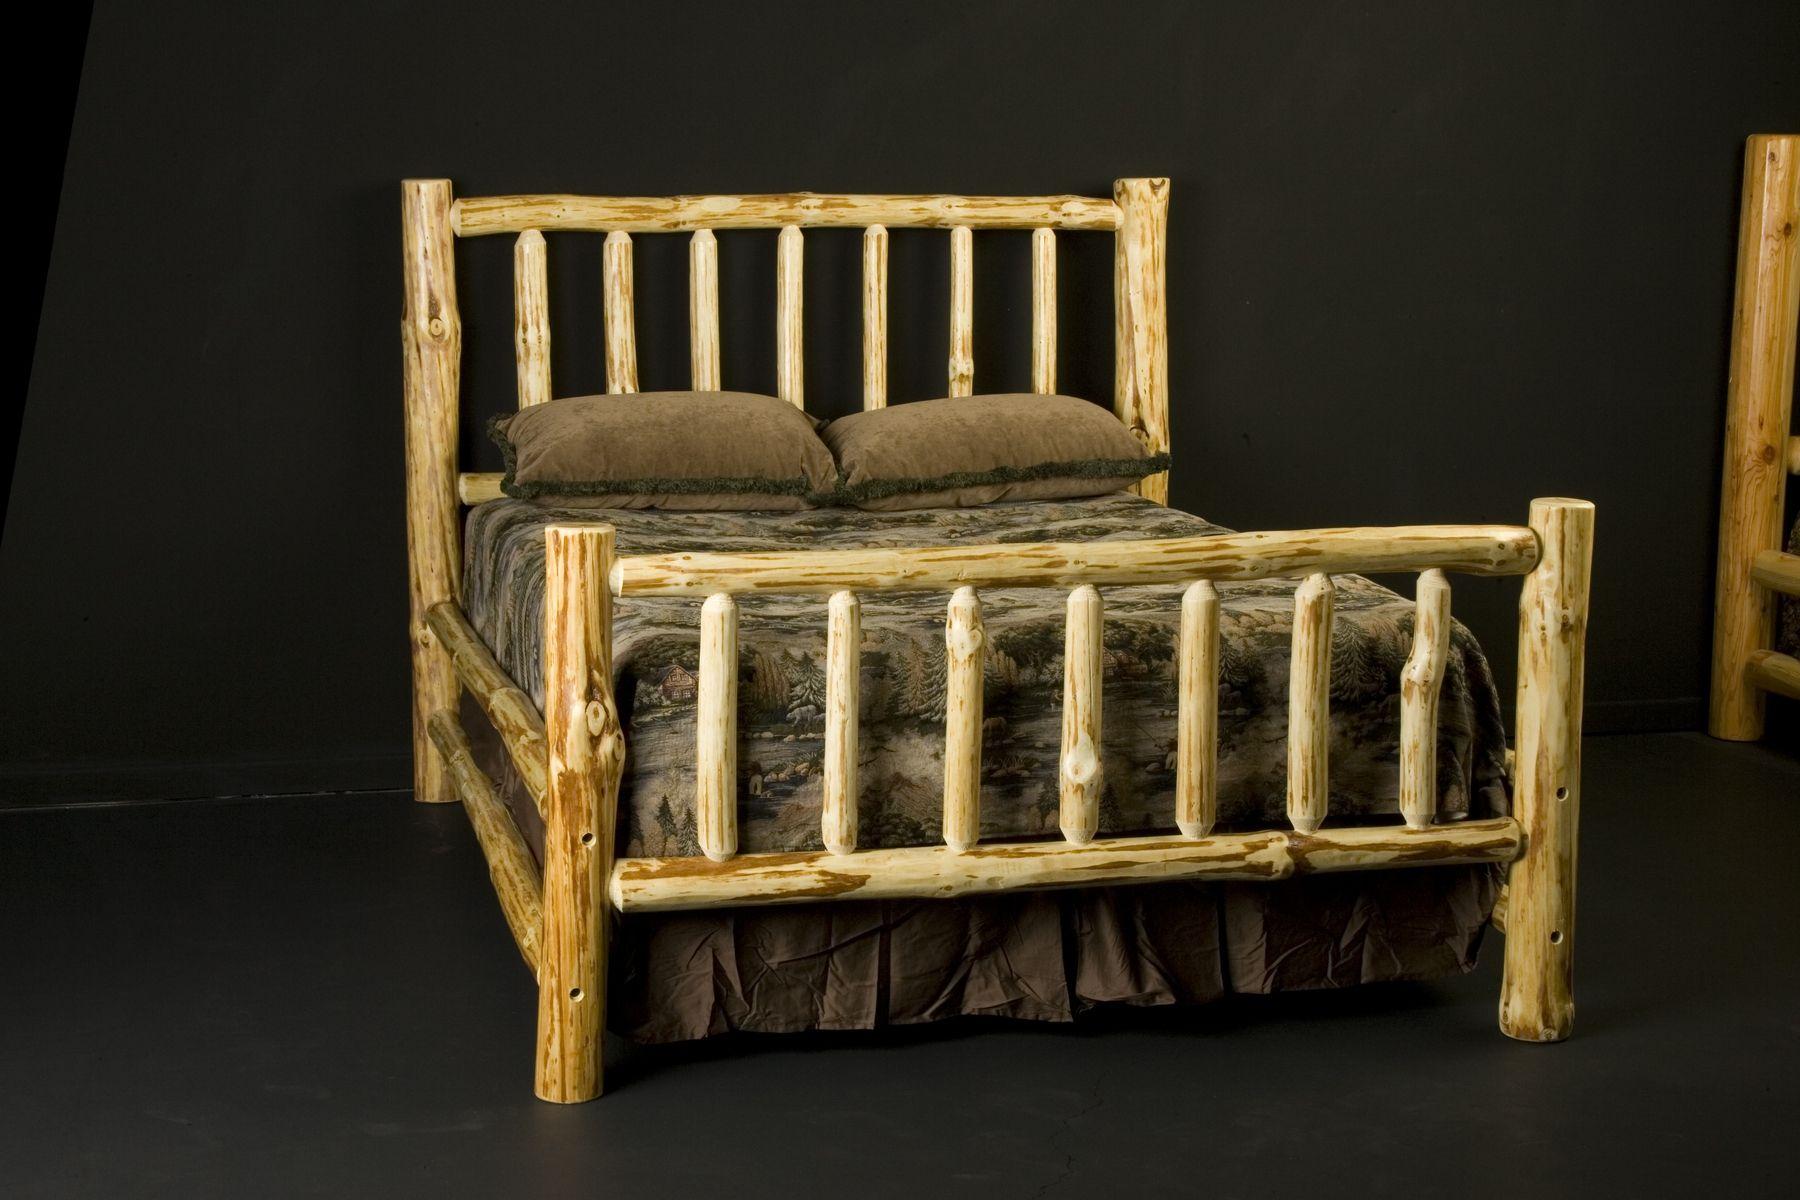 Wilderness Log Bed Frame Log Bed Frame Log Bedroom Furniture Log Cabin Bedroom Furniture